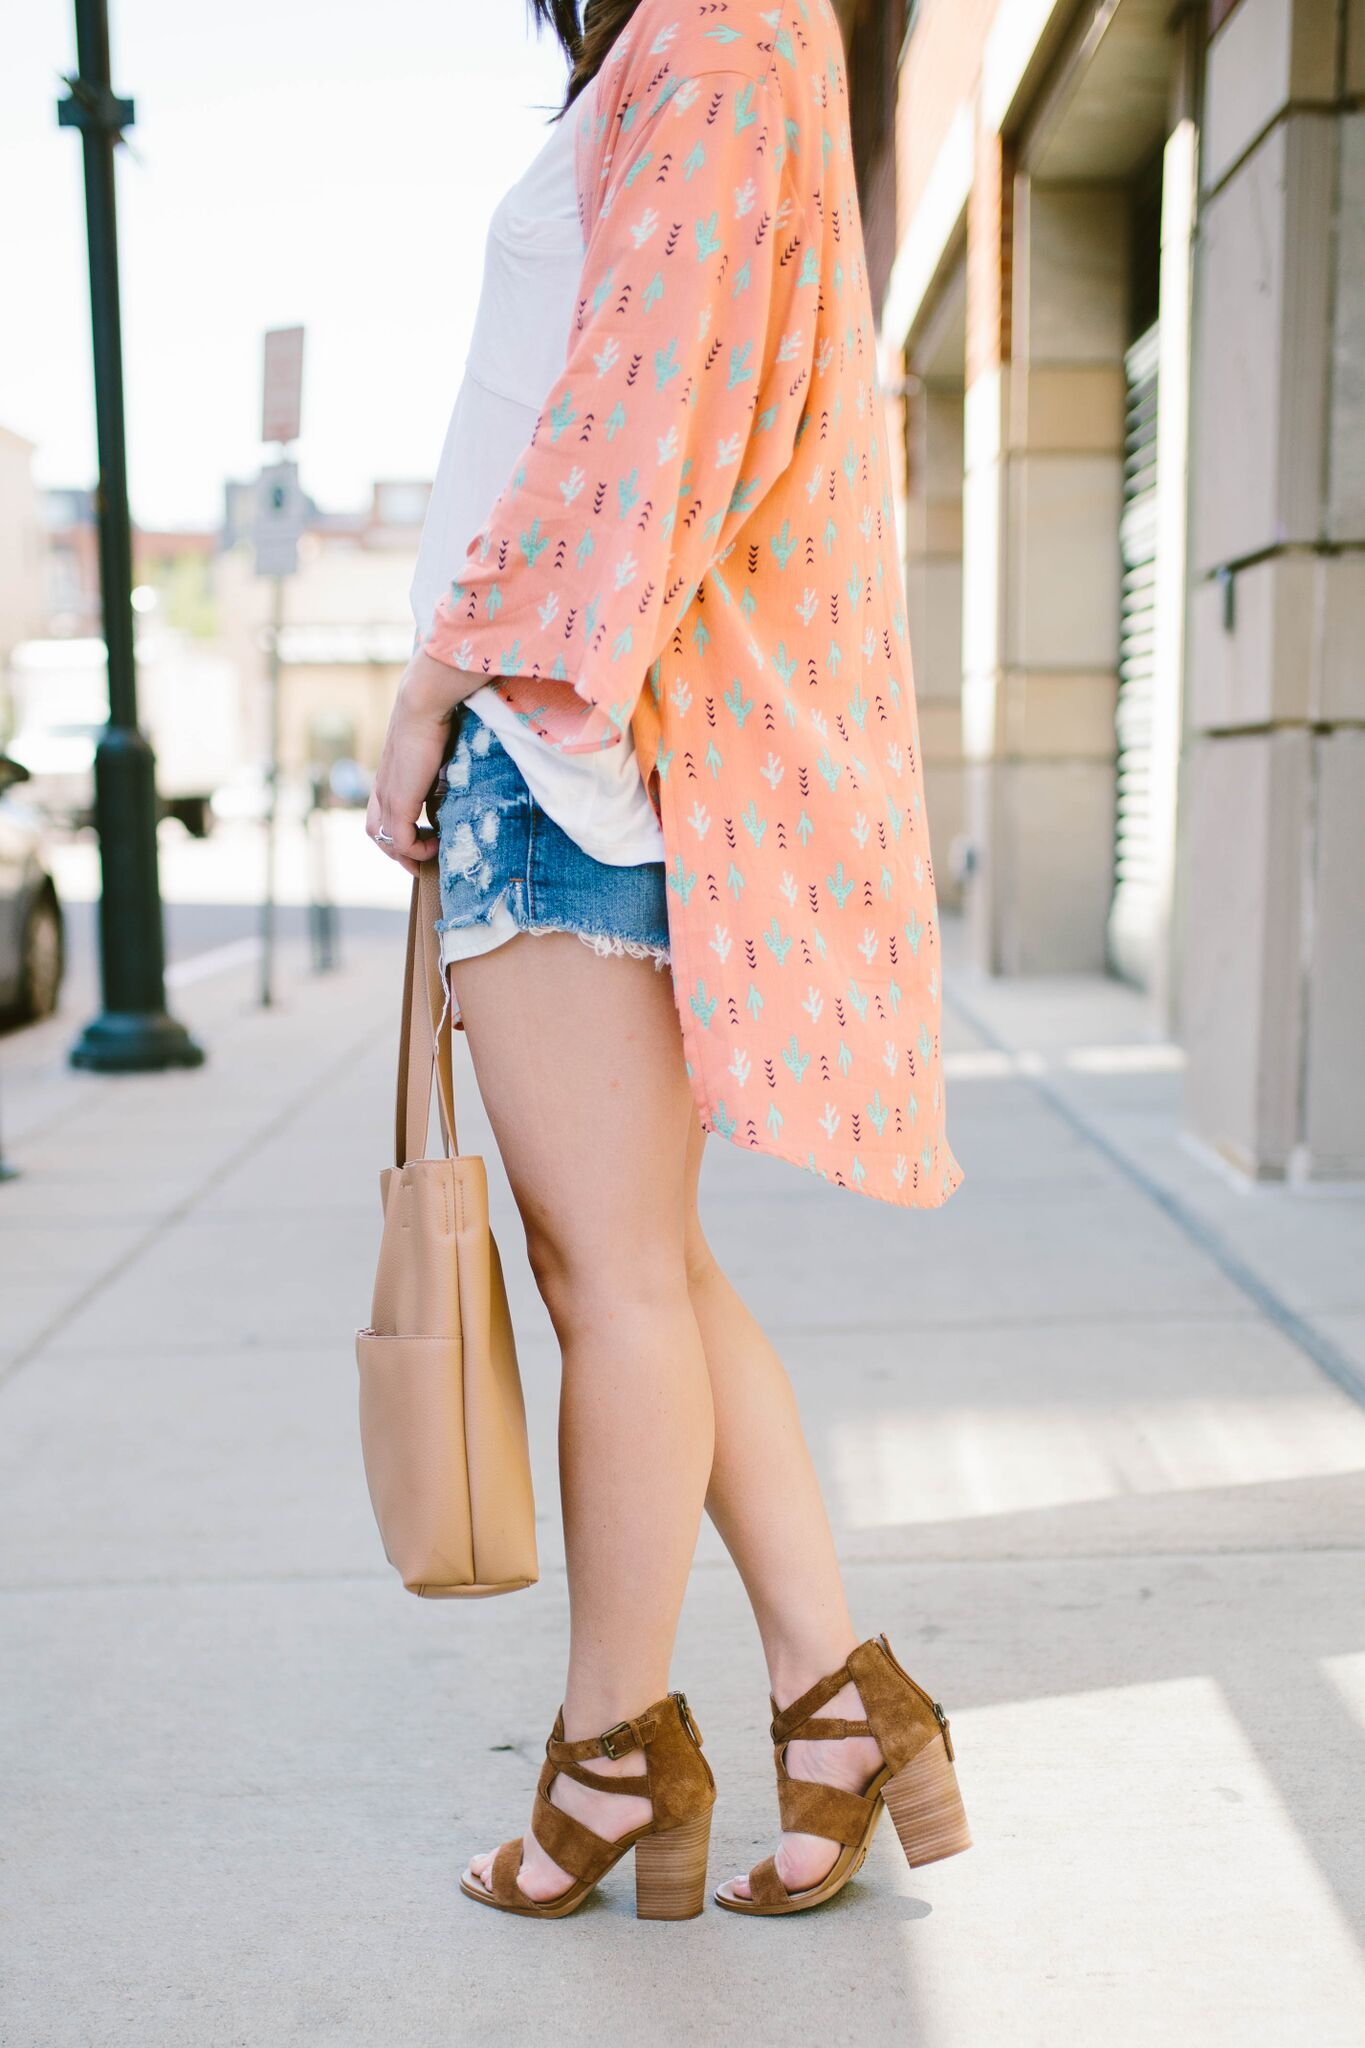 "<img src = how-to-wear-kimonos.jpg"" alt = ""how-to-wear-kimnos-cora-block-heel-sandal-distressed-denim-shorts"">"